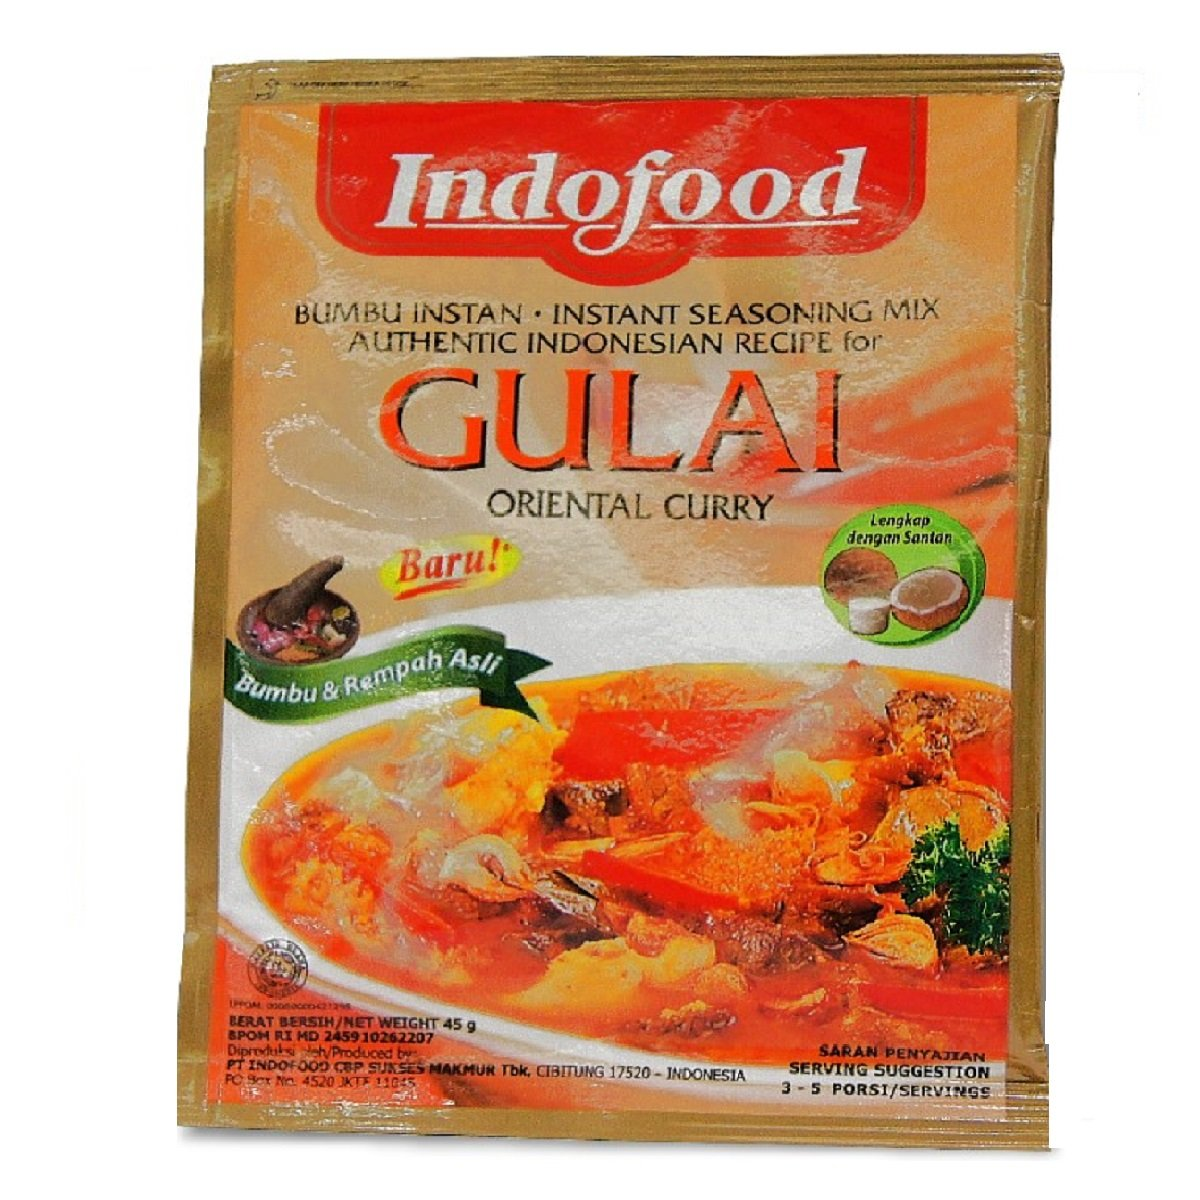 INDOFOOD INSTANT SEASONING GULAI (BOX)